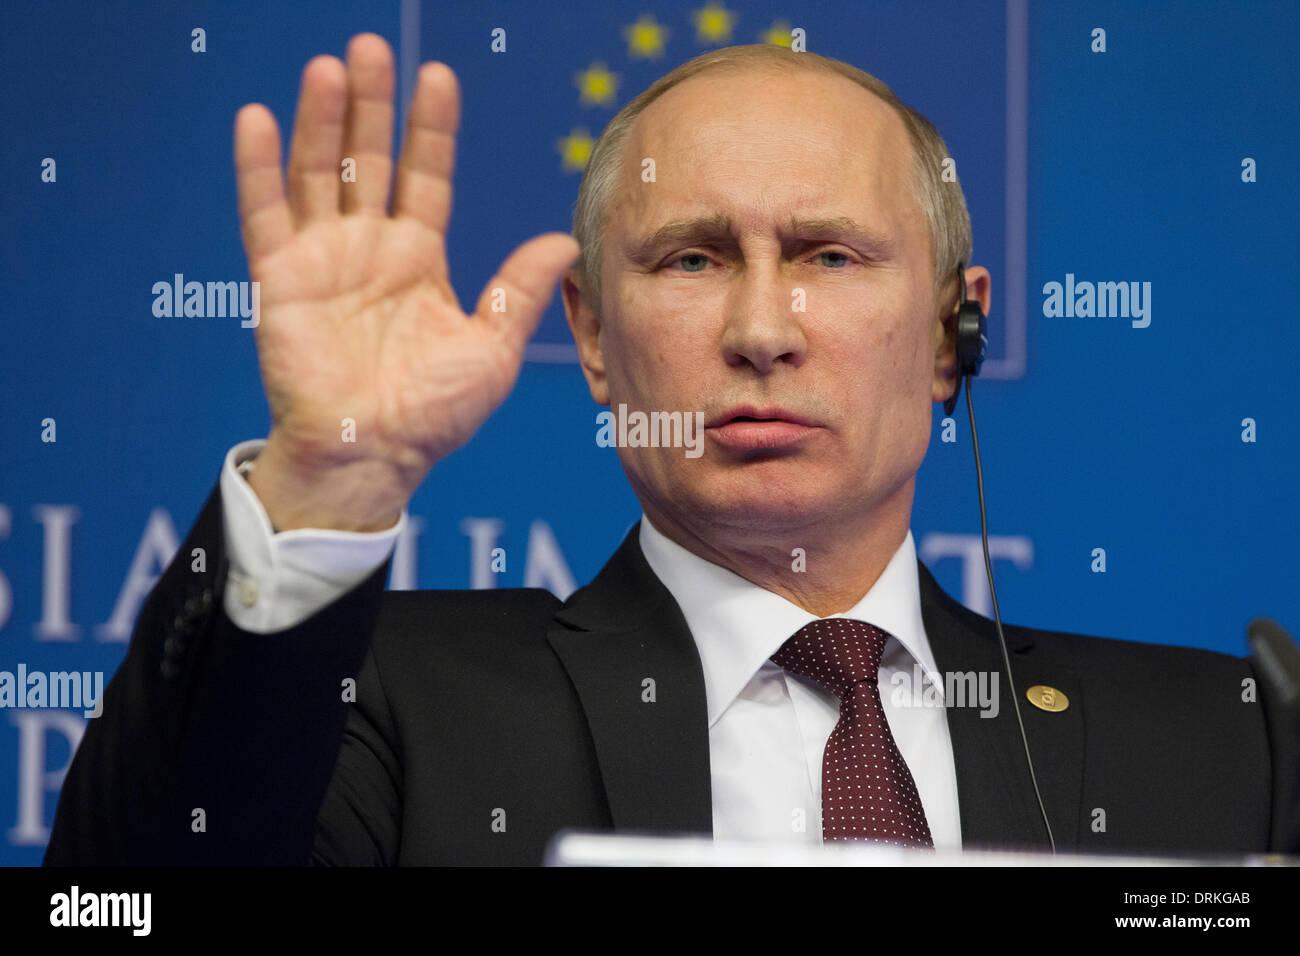 Vladimir Putin - Stock Image